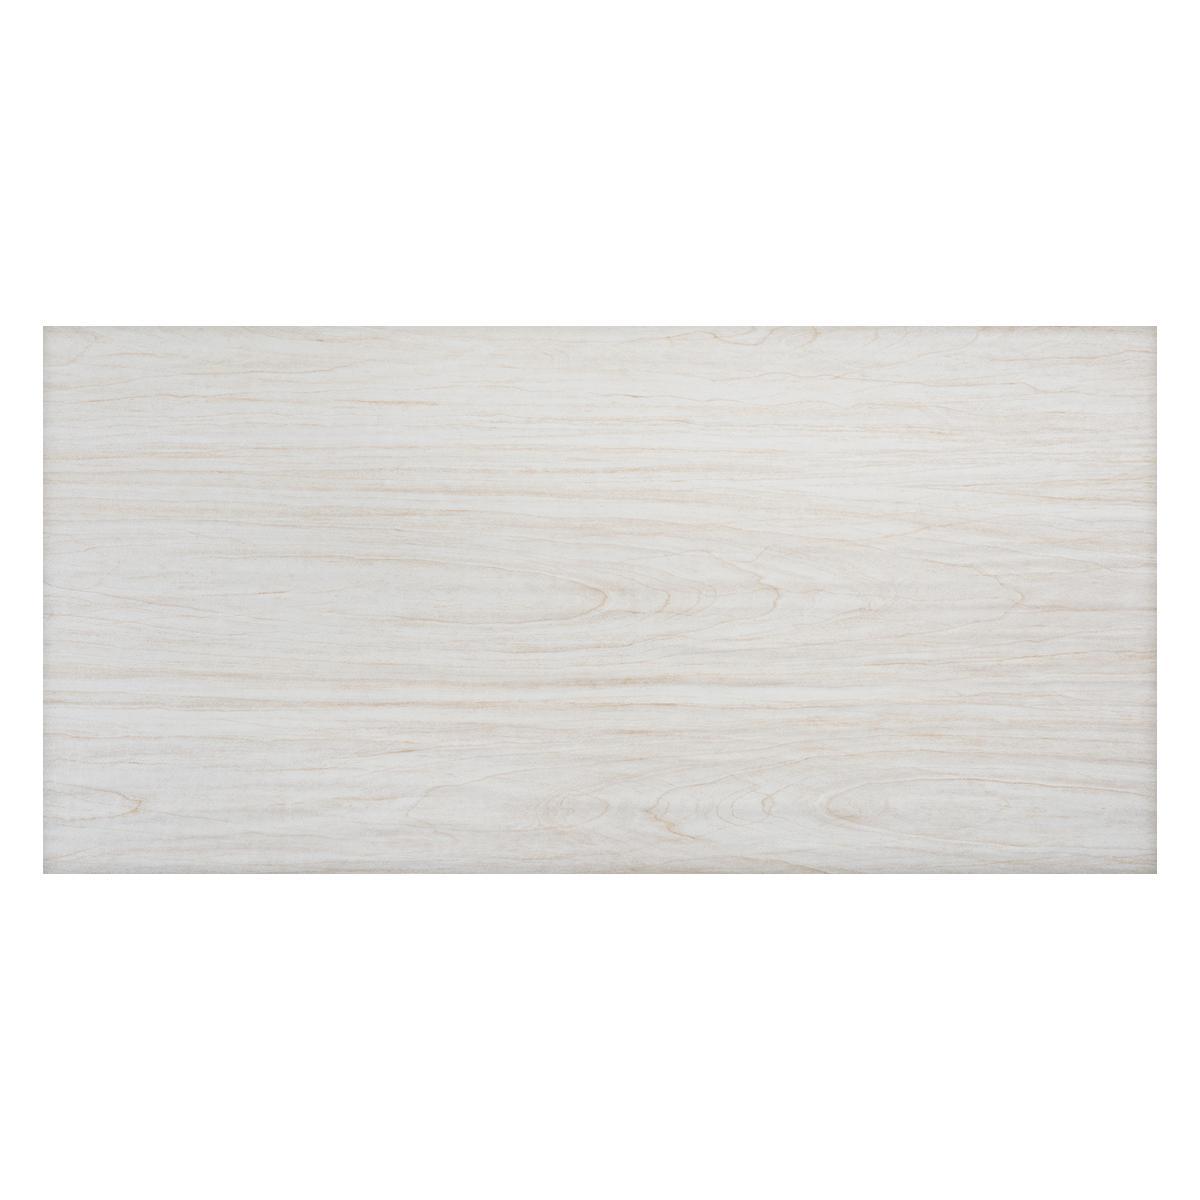 Porcelanato Onix Beige Mate - 45X90 - 1.21 m2